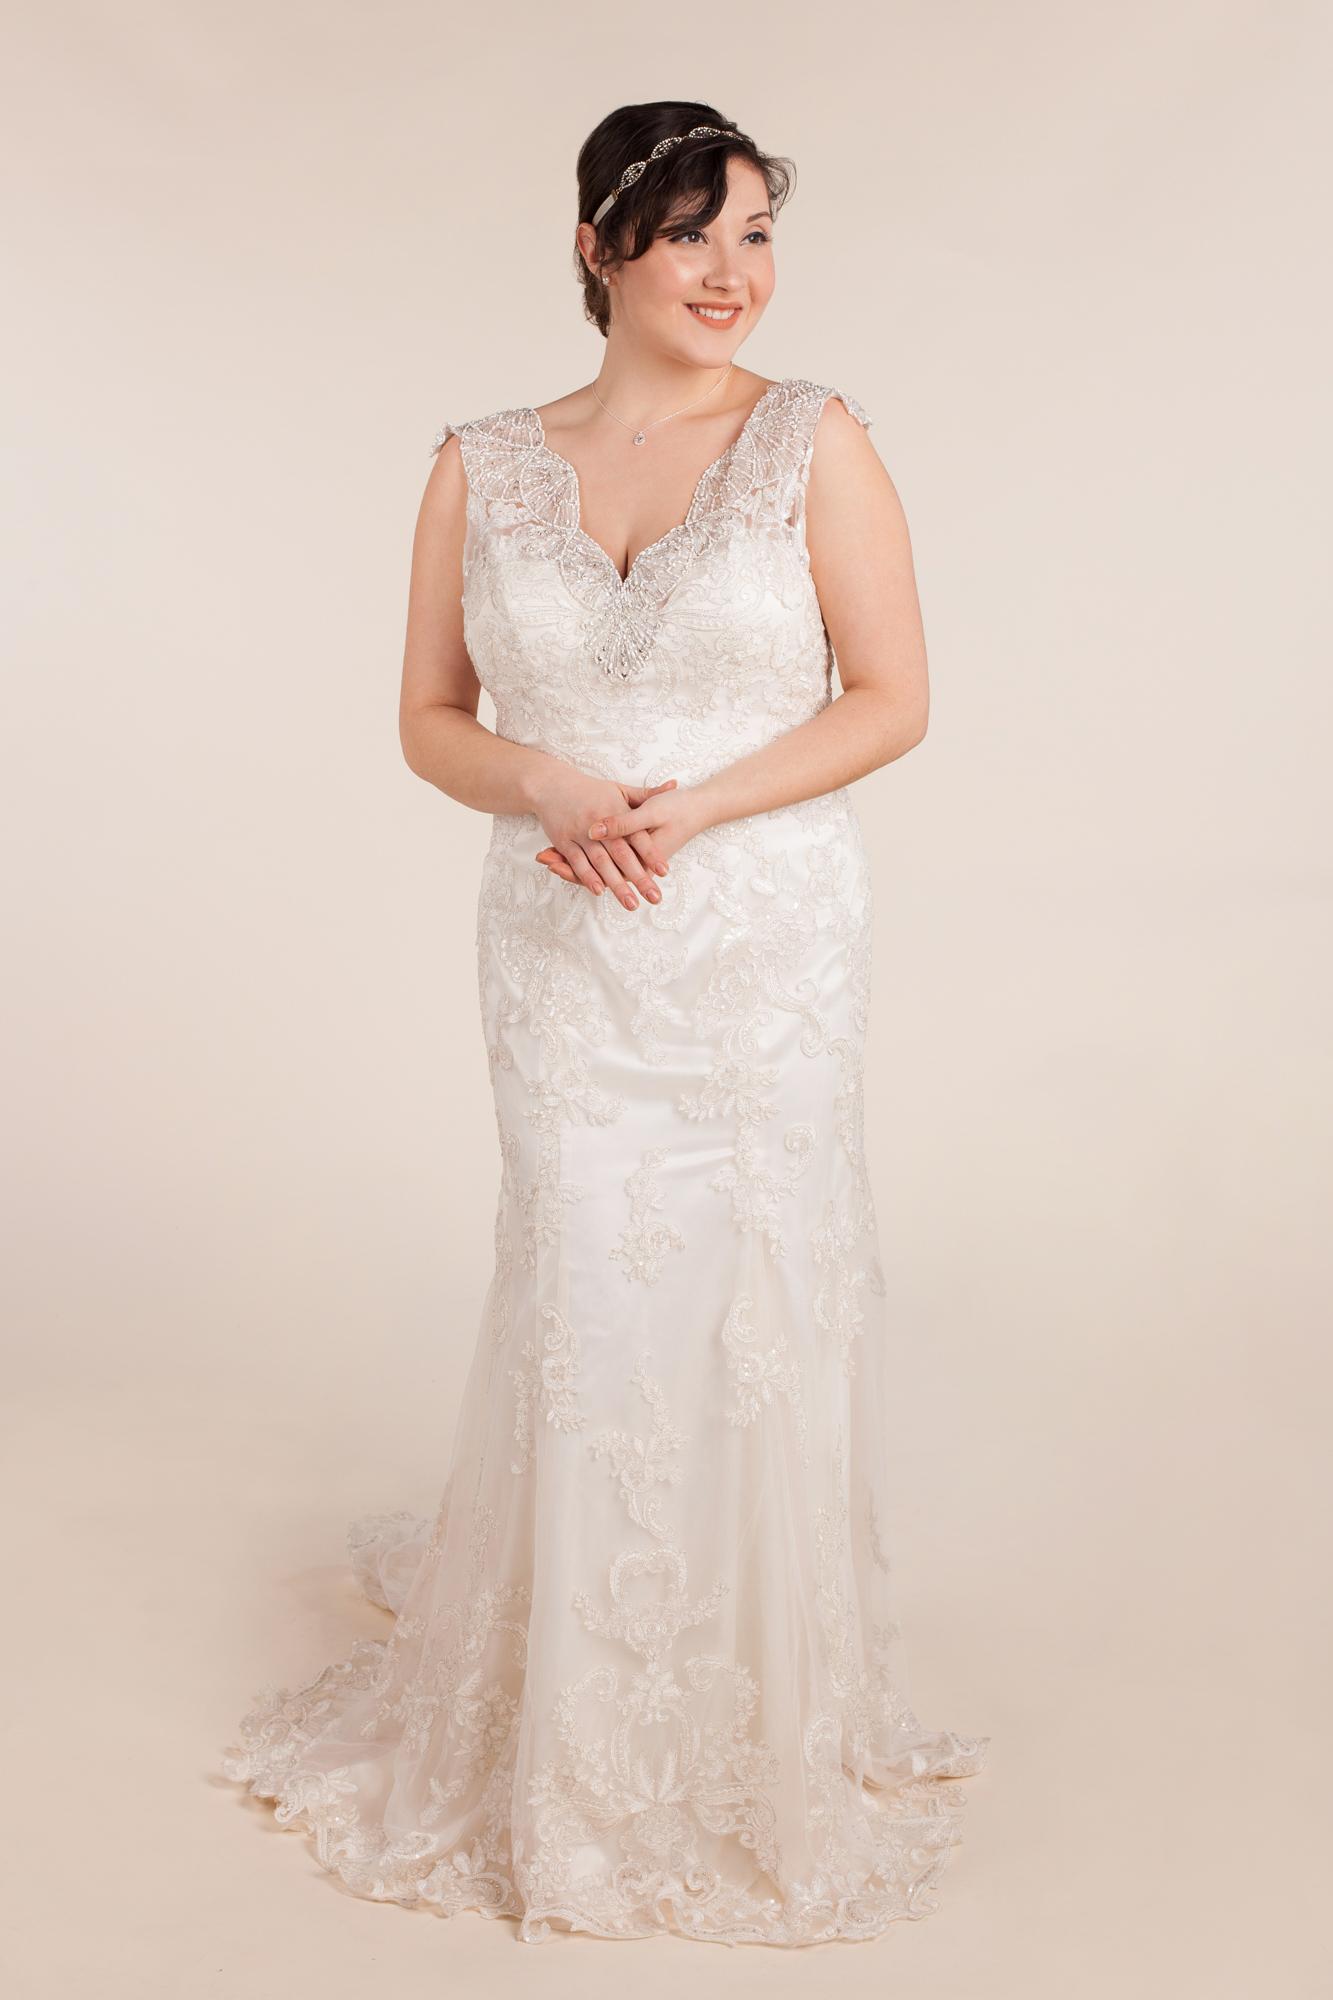 Maggie Sottero - Elison - size  - $876 - (27% OFF)